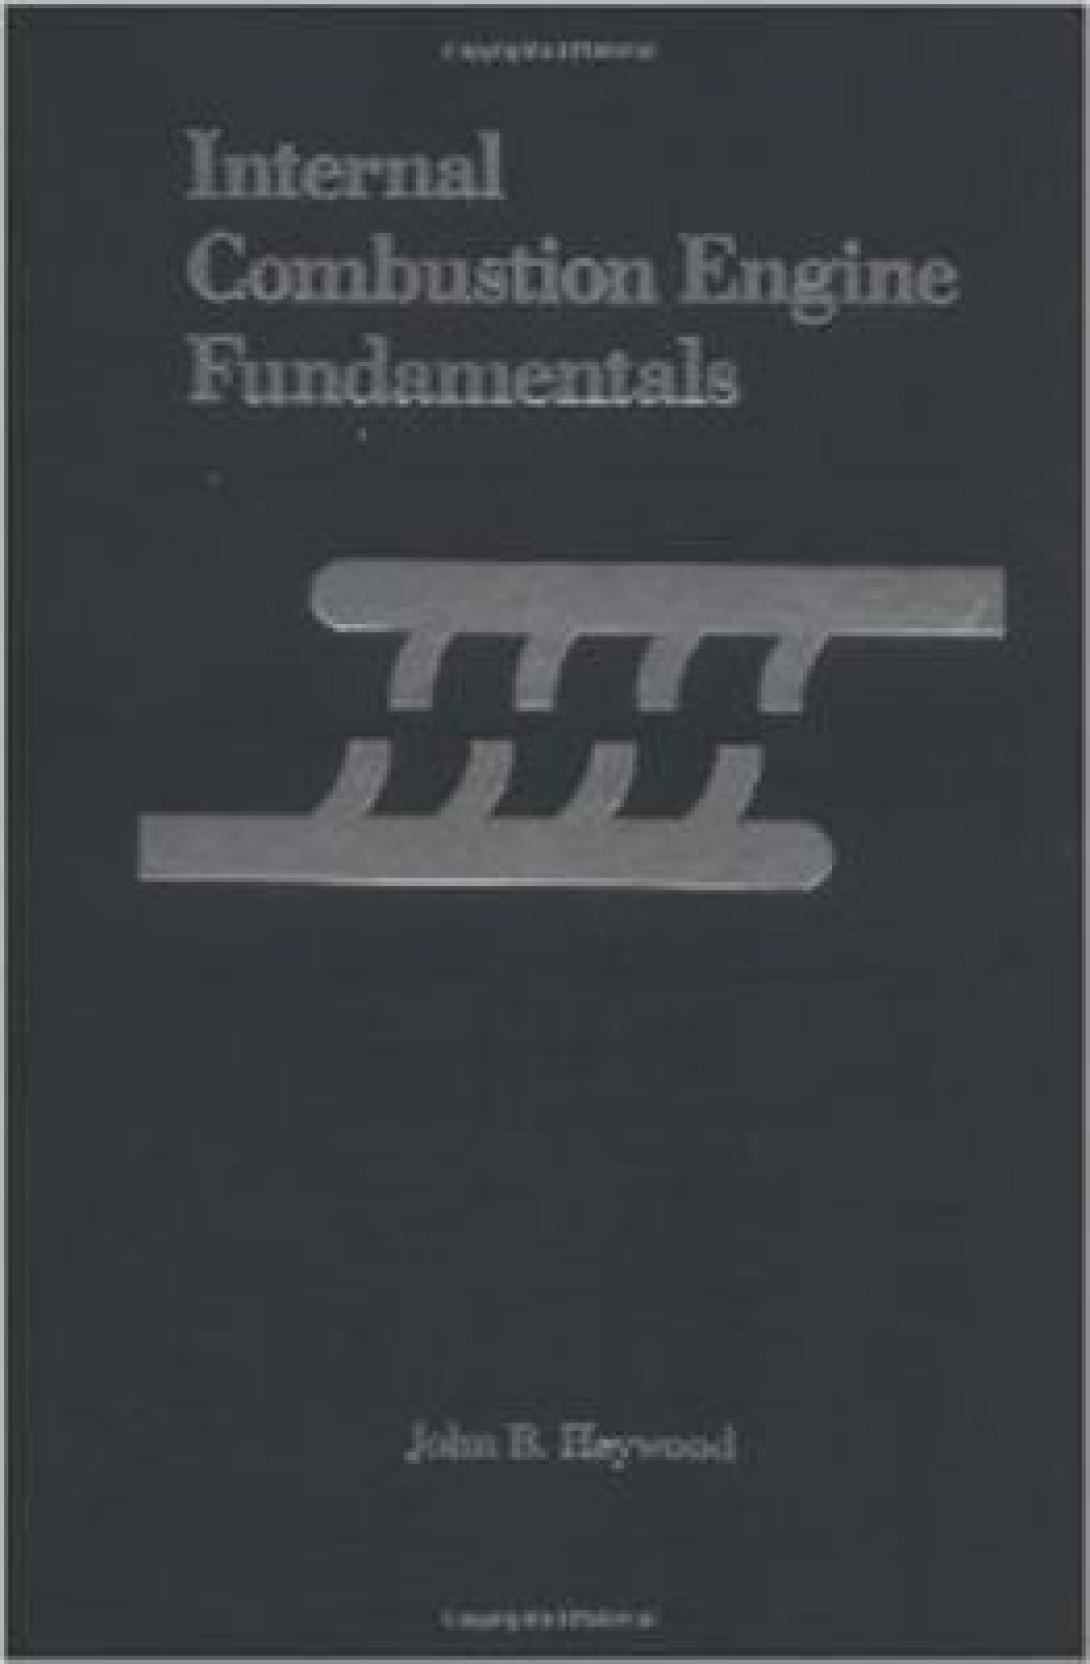 Internal Combustion Engine Fundamentals 1st Edition Buy External Diagram Share